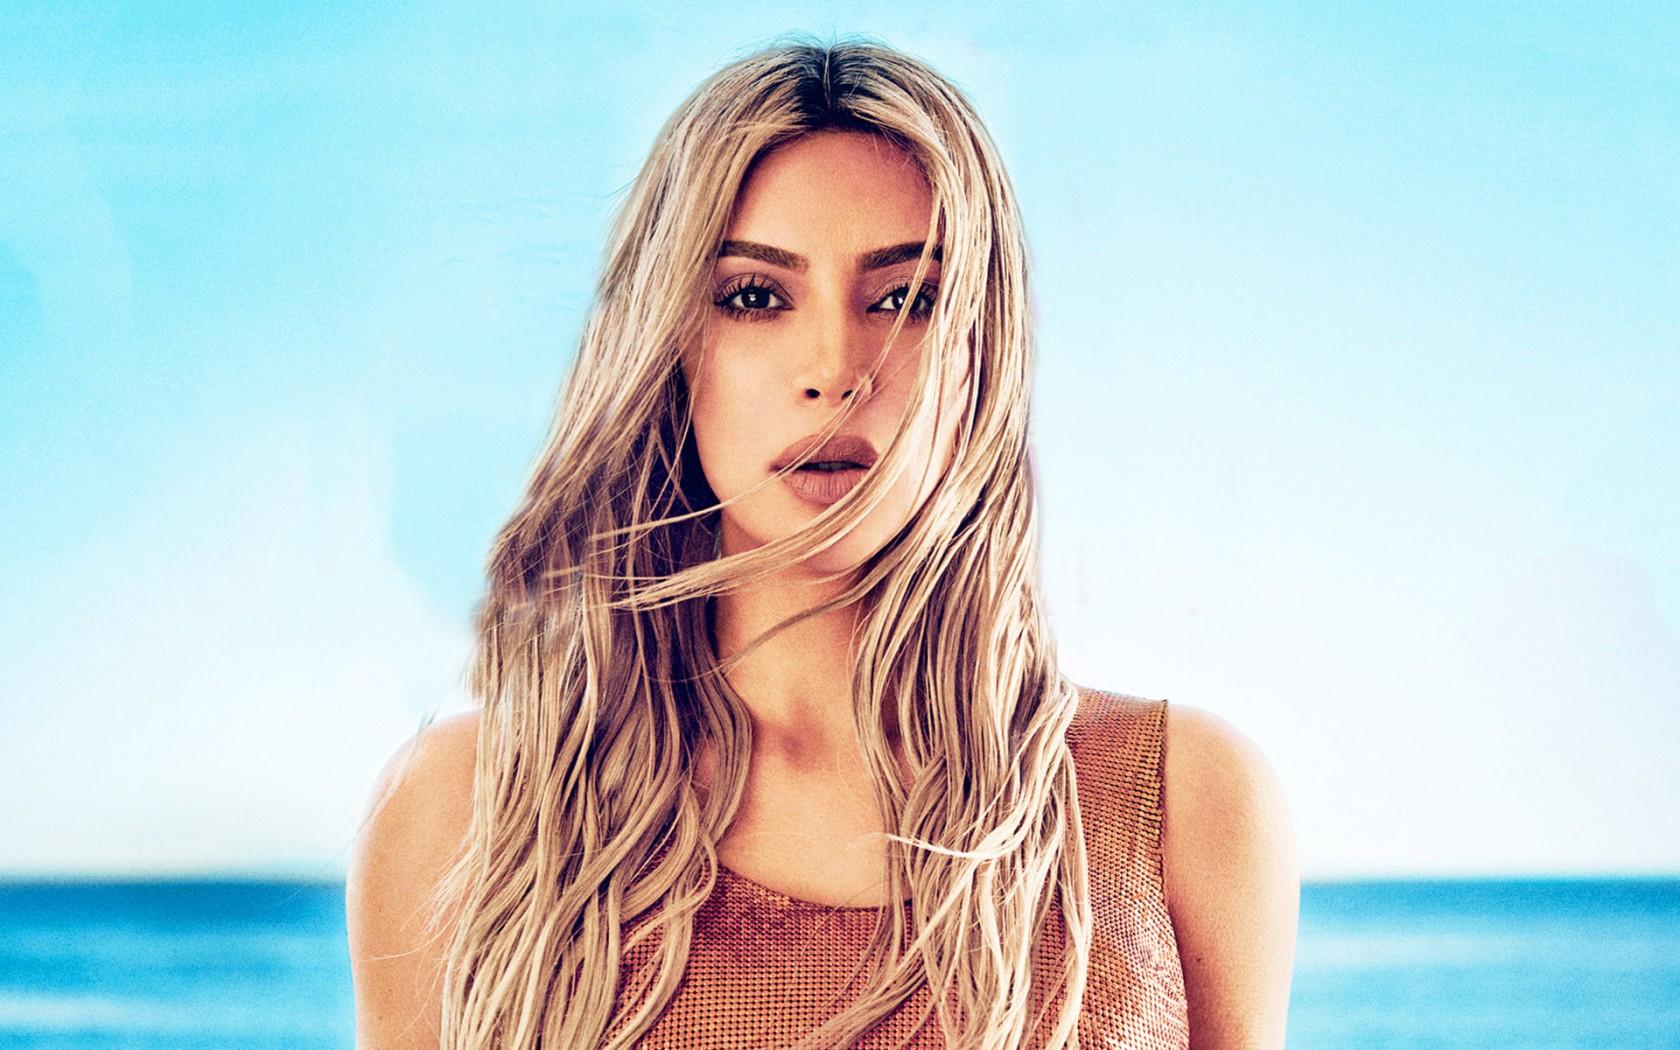 Windows 10 Nature Wallpaper Hd 3d For Desktop Kim Kardashian Elle 2018 Wallpapers Hd Wallpapers Id